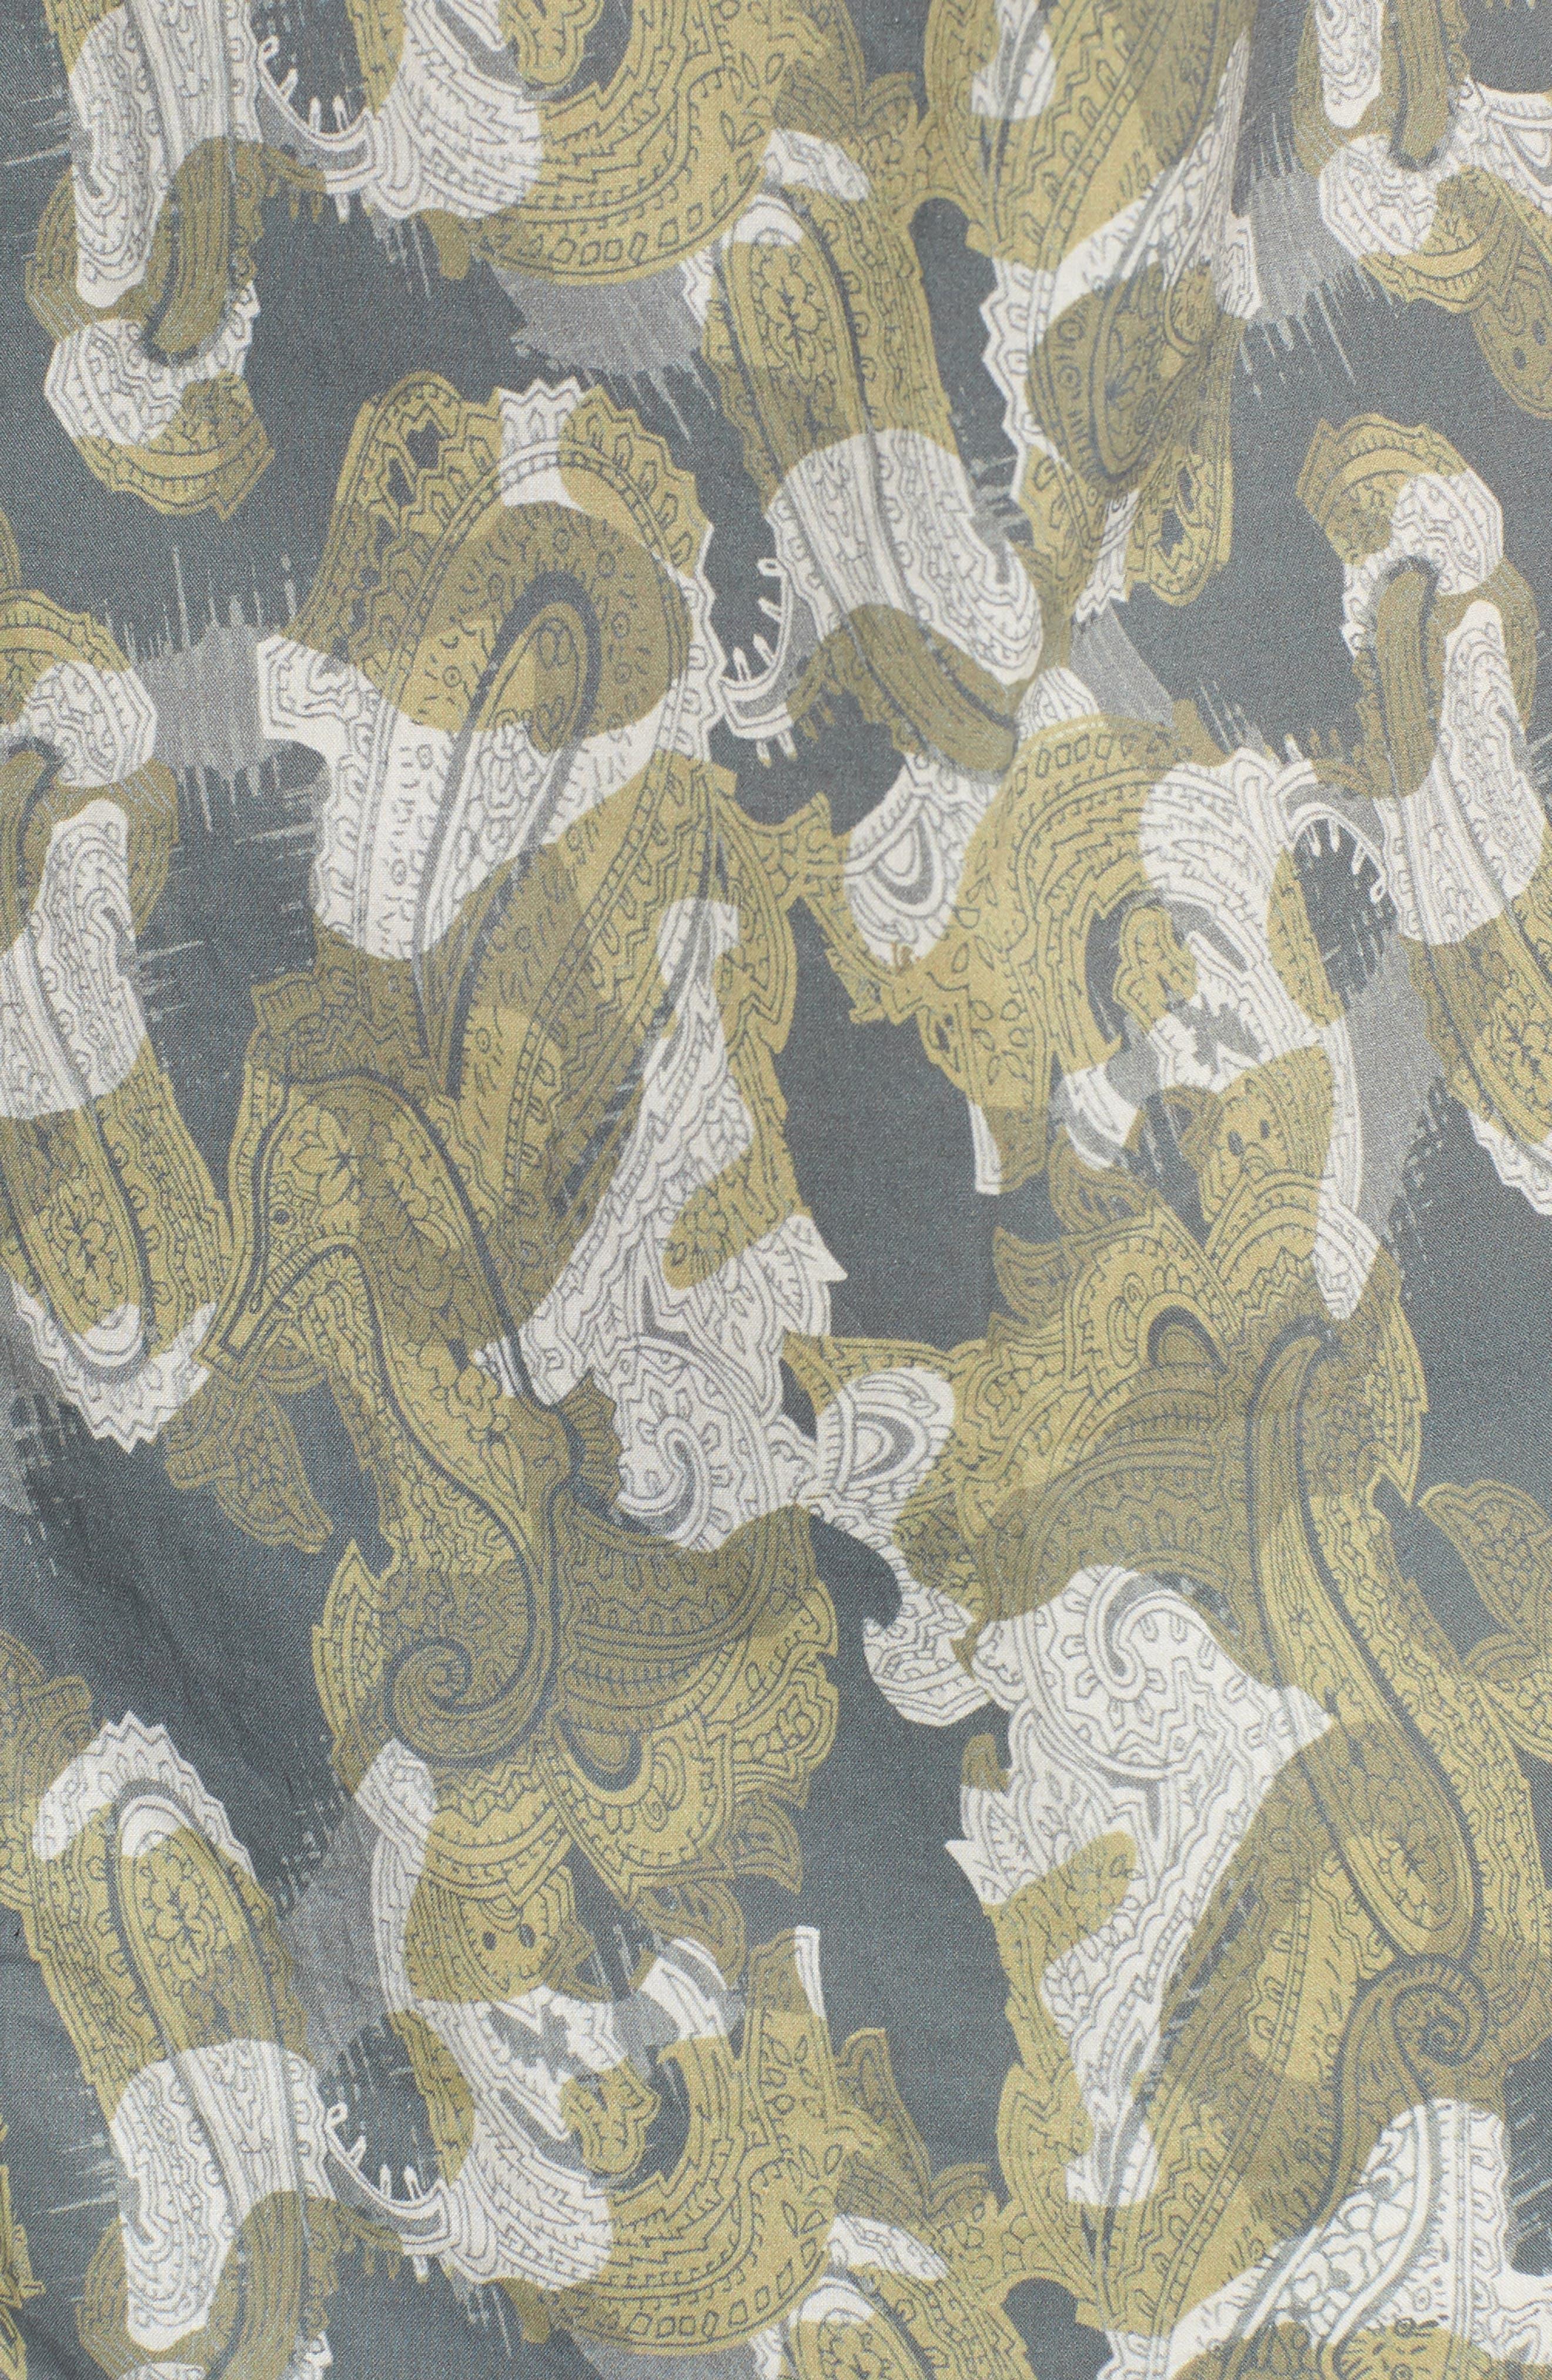 Paisley Print Short Sleeve Sport Shirt,                             Alternate thumbnail 5, color,                             Seahorse Paisley Print